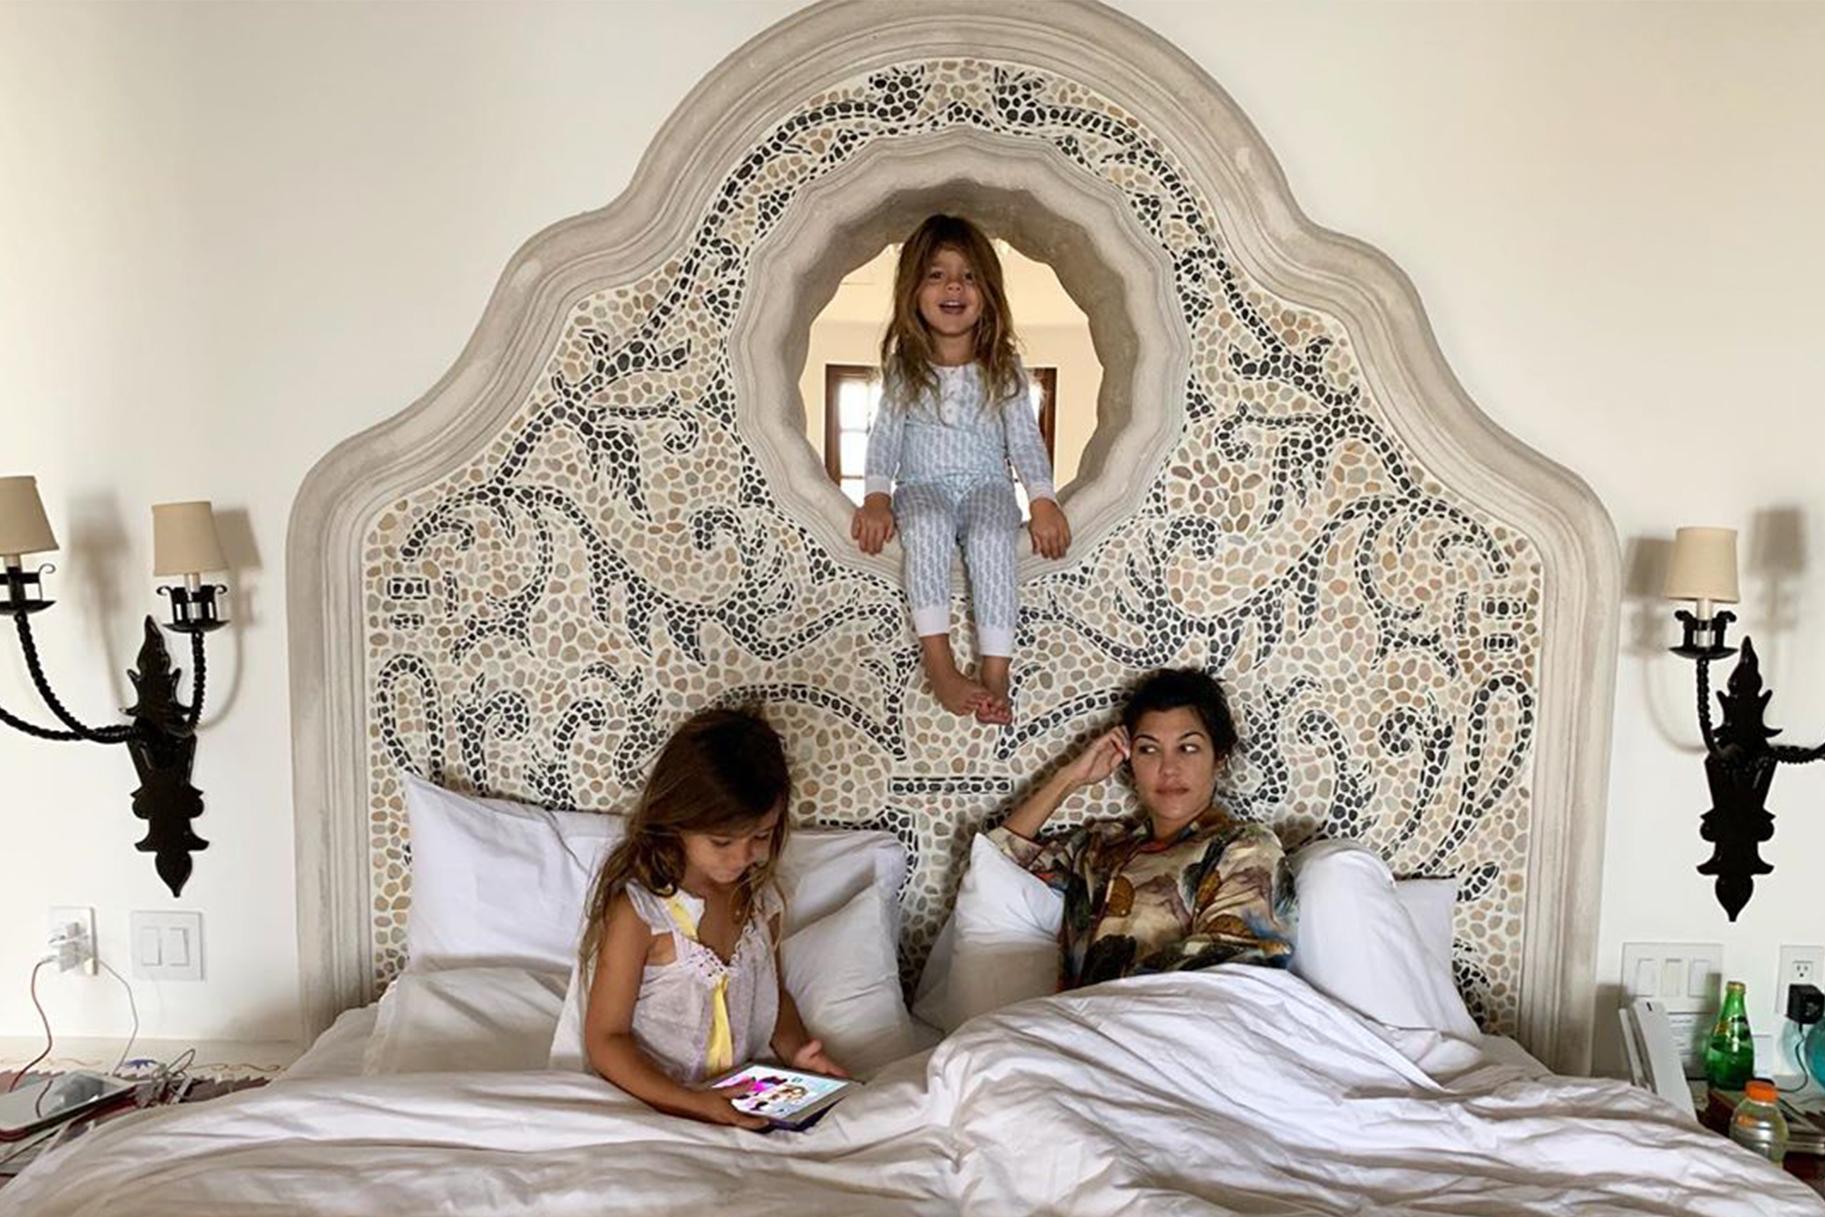 Kourtney Kardashian Lifestyle Website Poosh Best Home Tips